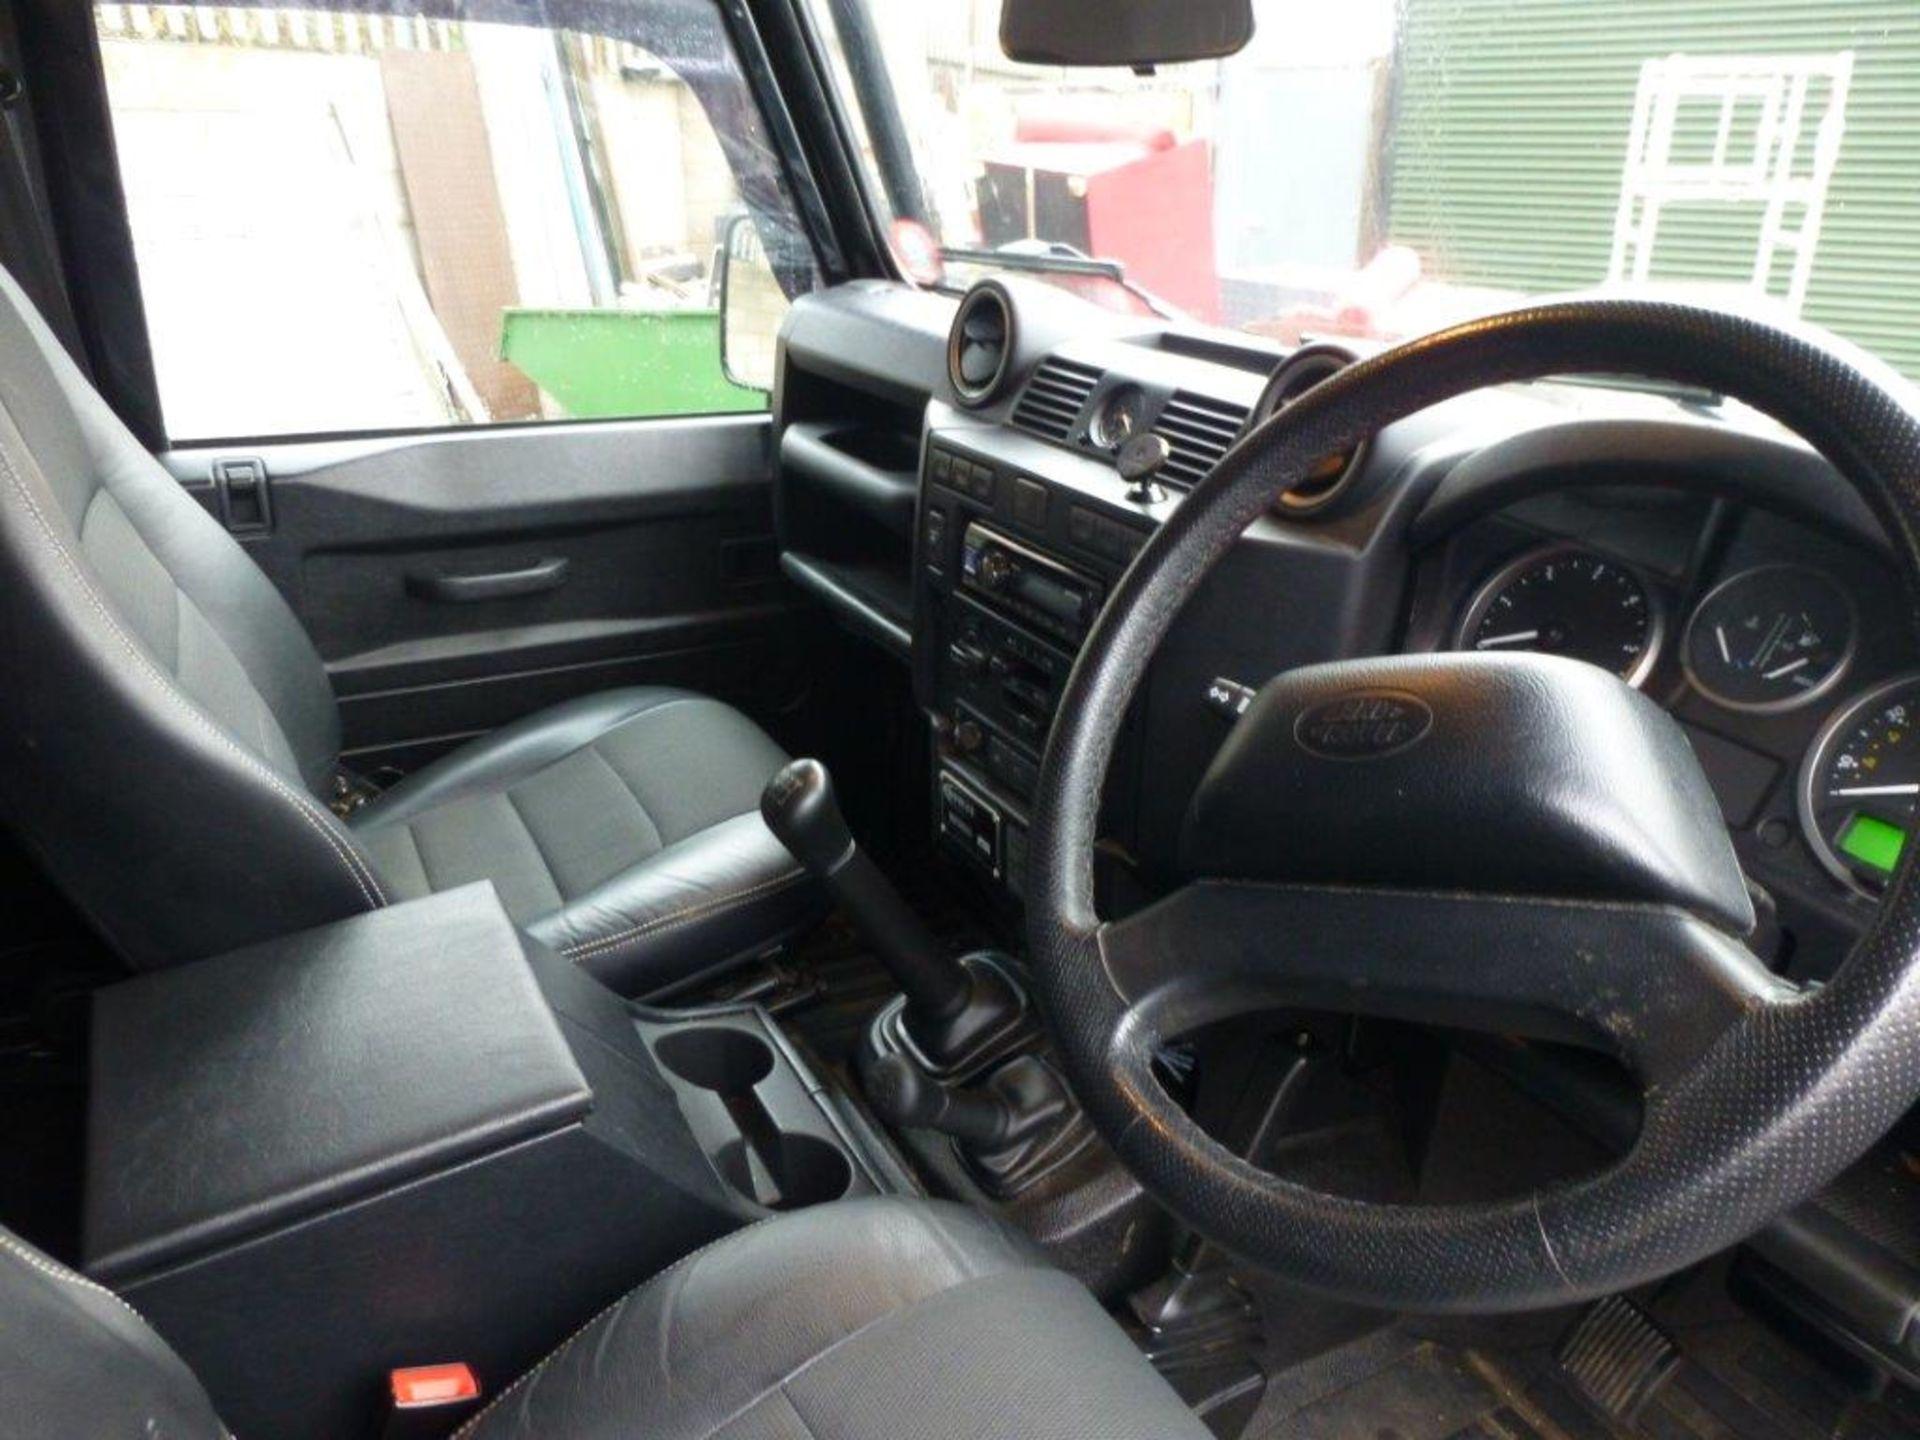 Land Rover Defender 110 XS Bowler double cab pickup TDCi (2.2). Reg no. T9 FNK. Reg. date 23/03/ - Image 9 of 13